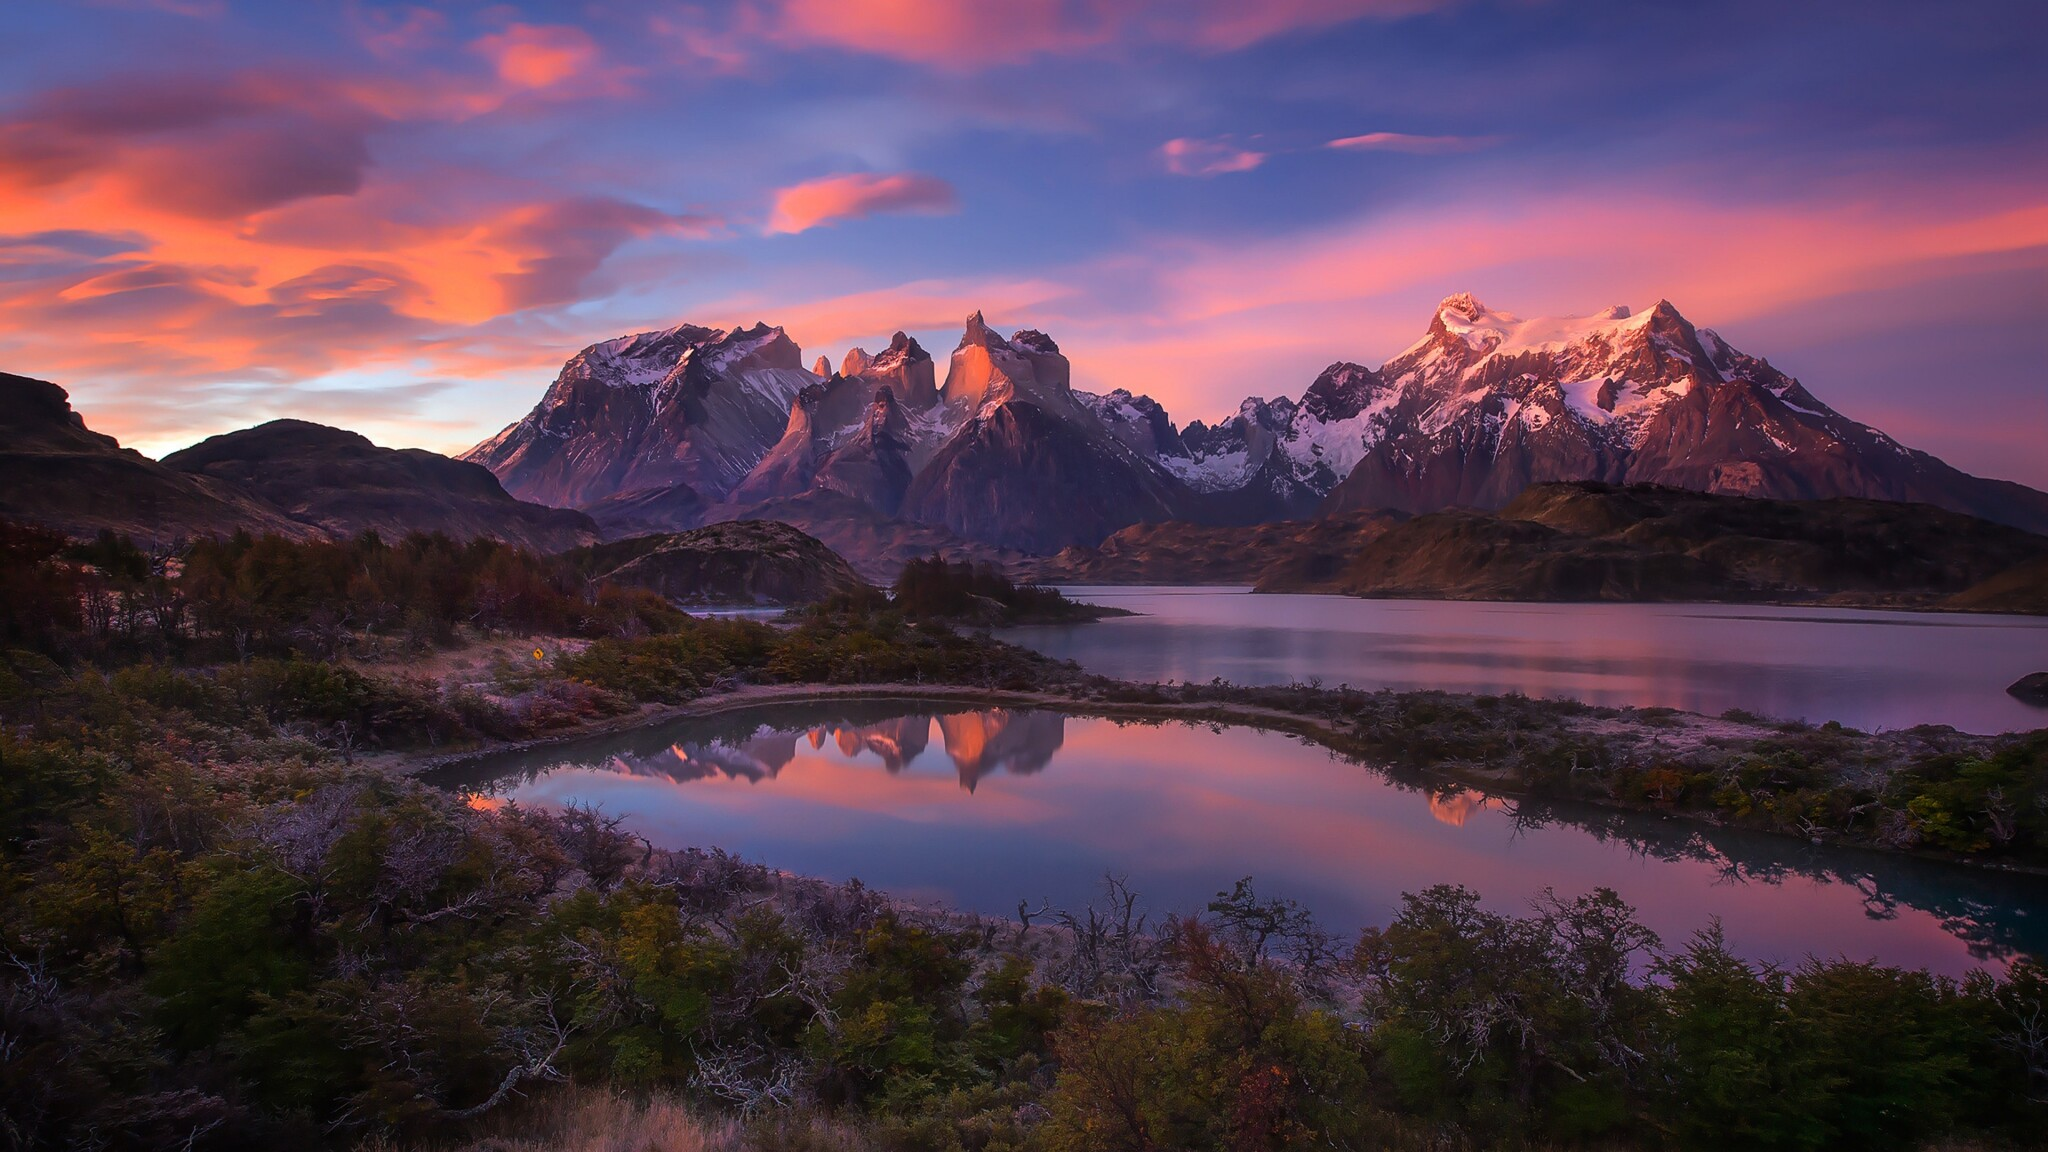 2048x1152 South America Patagonia Andes Mountains Lake 2048x1152